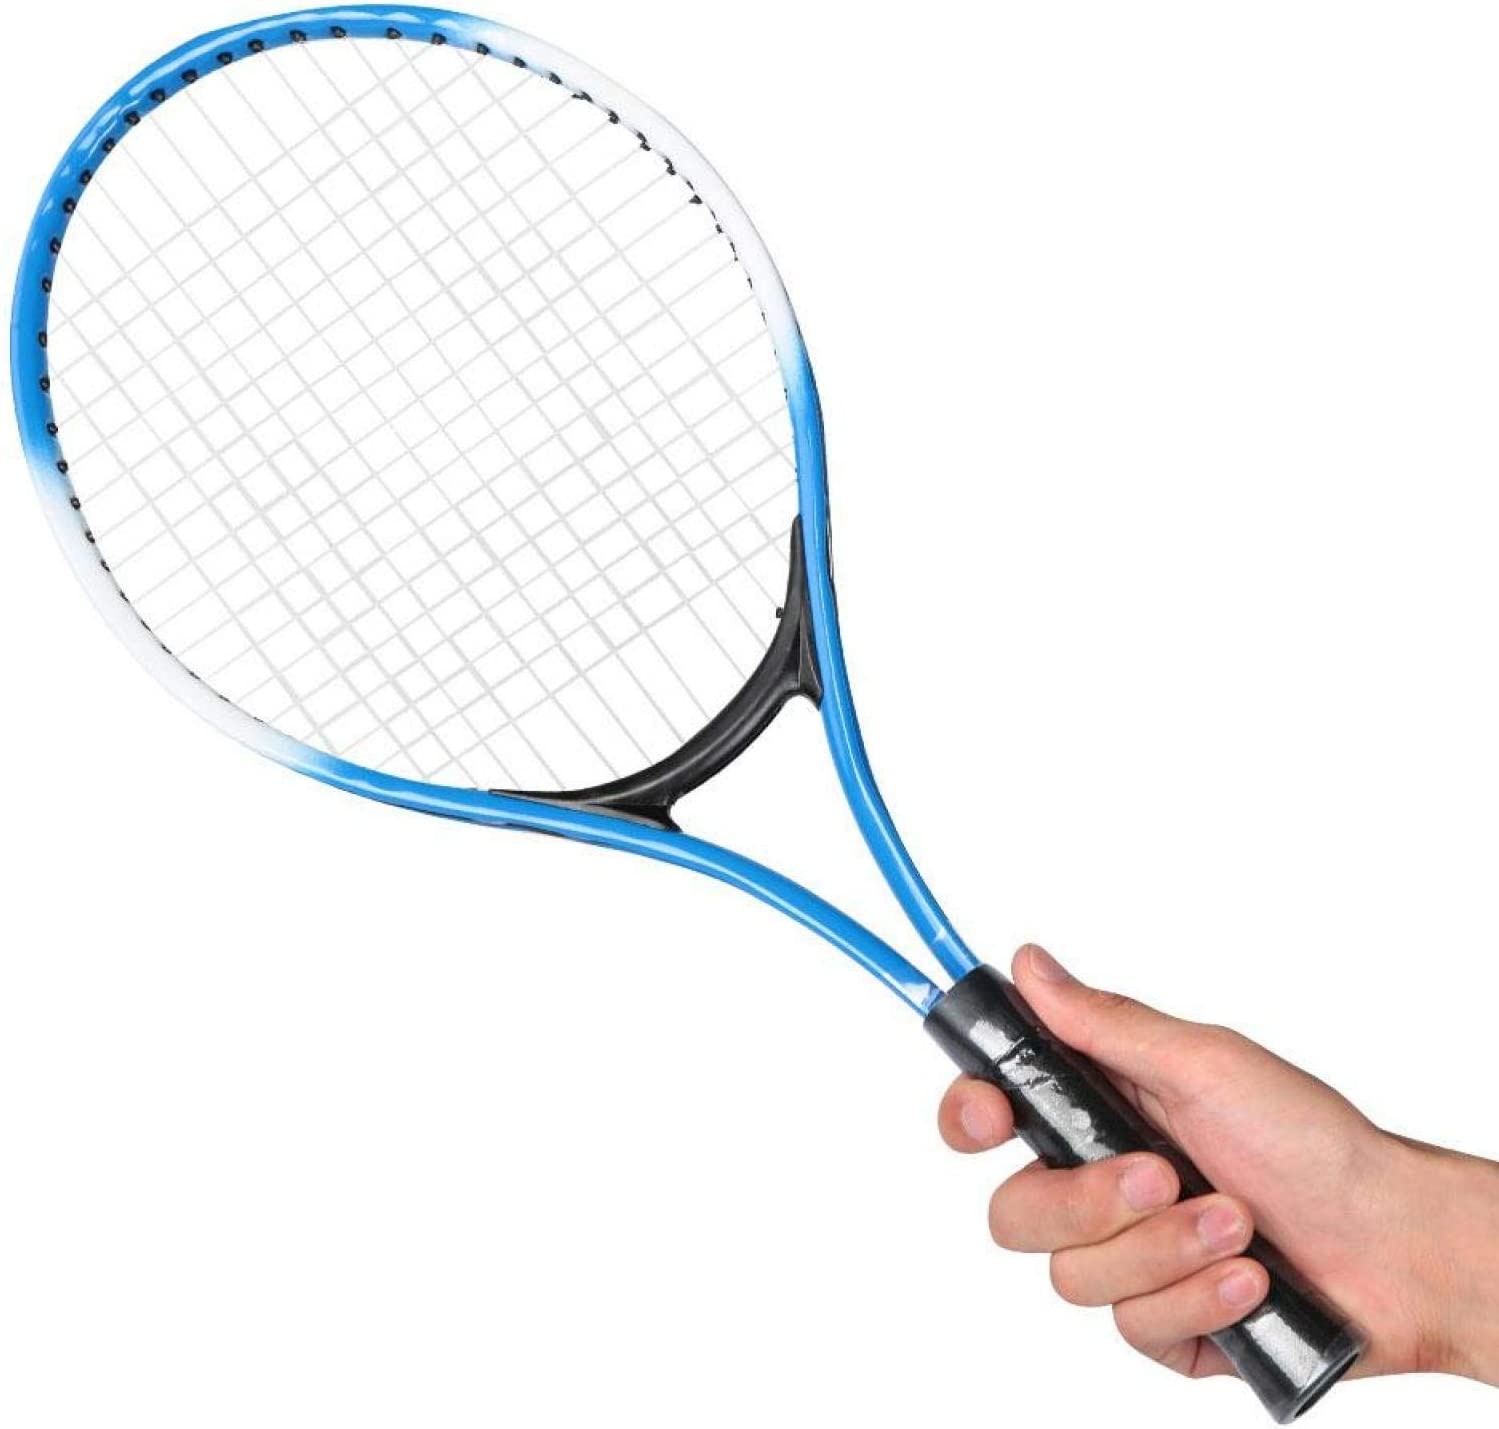 Children Tennis Racket Iron Alloy Beginner Tennis Racquet Sports Accessory with Ball and Carry Bag